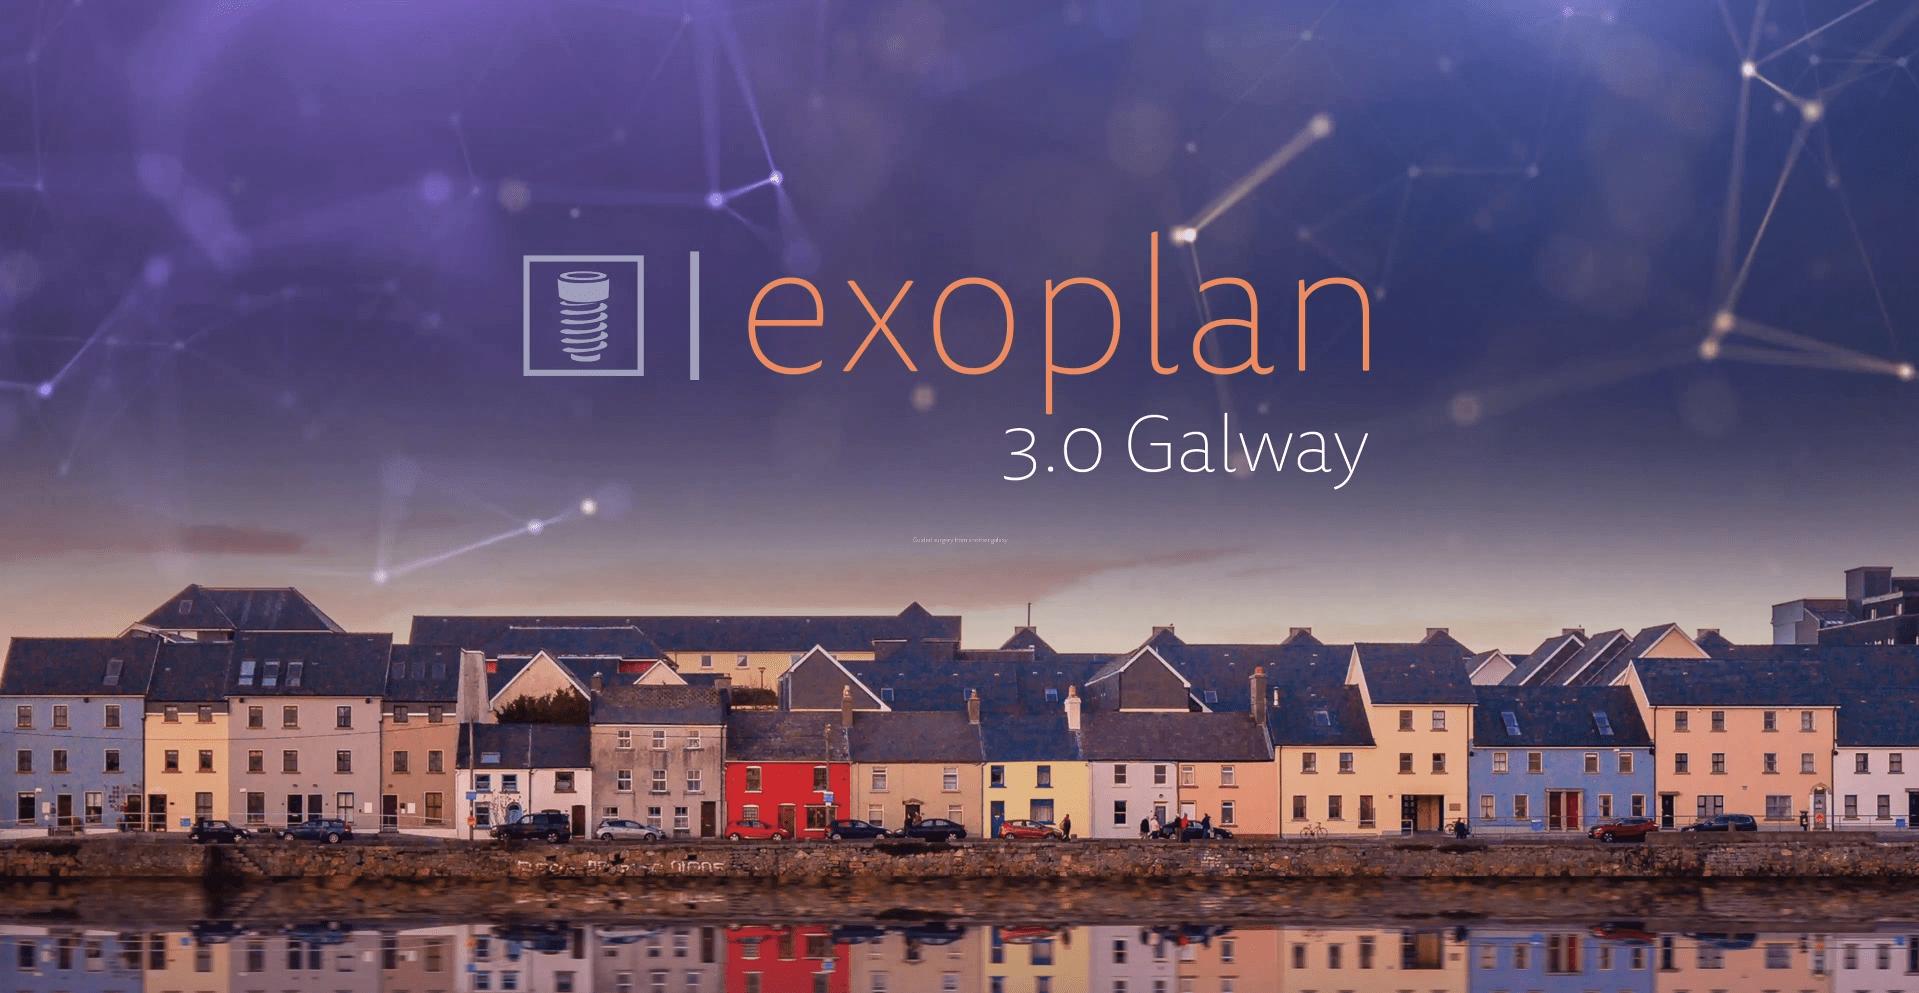 exoplan 3.0 Galway crack Engine Build 7654